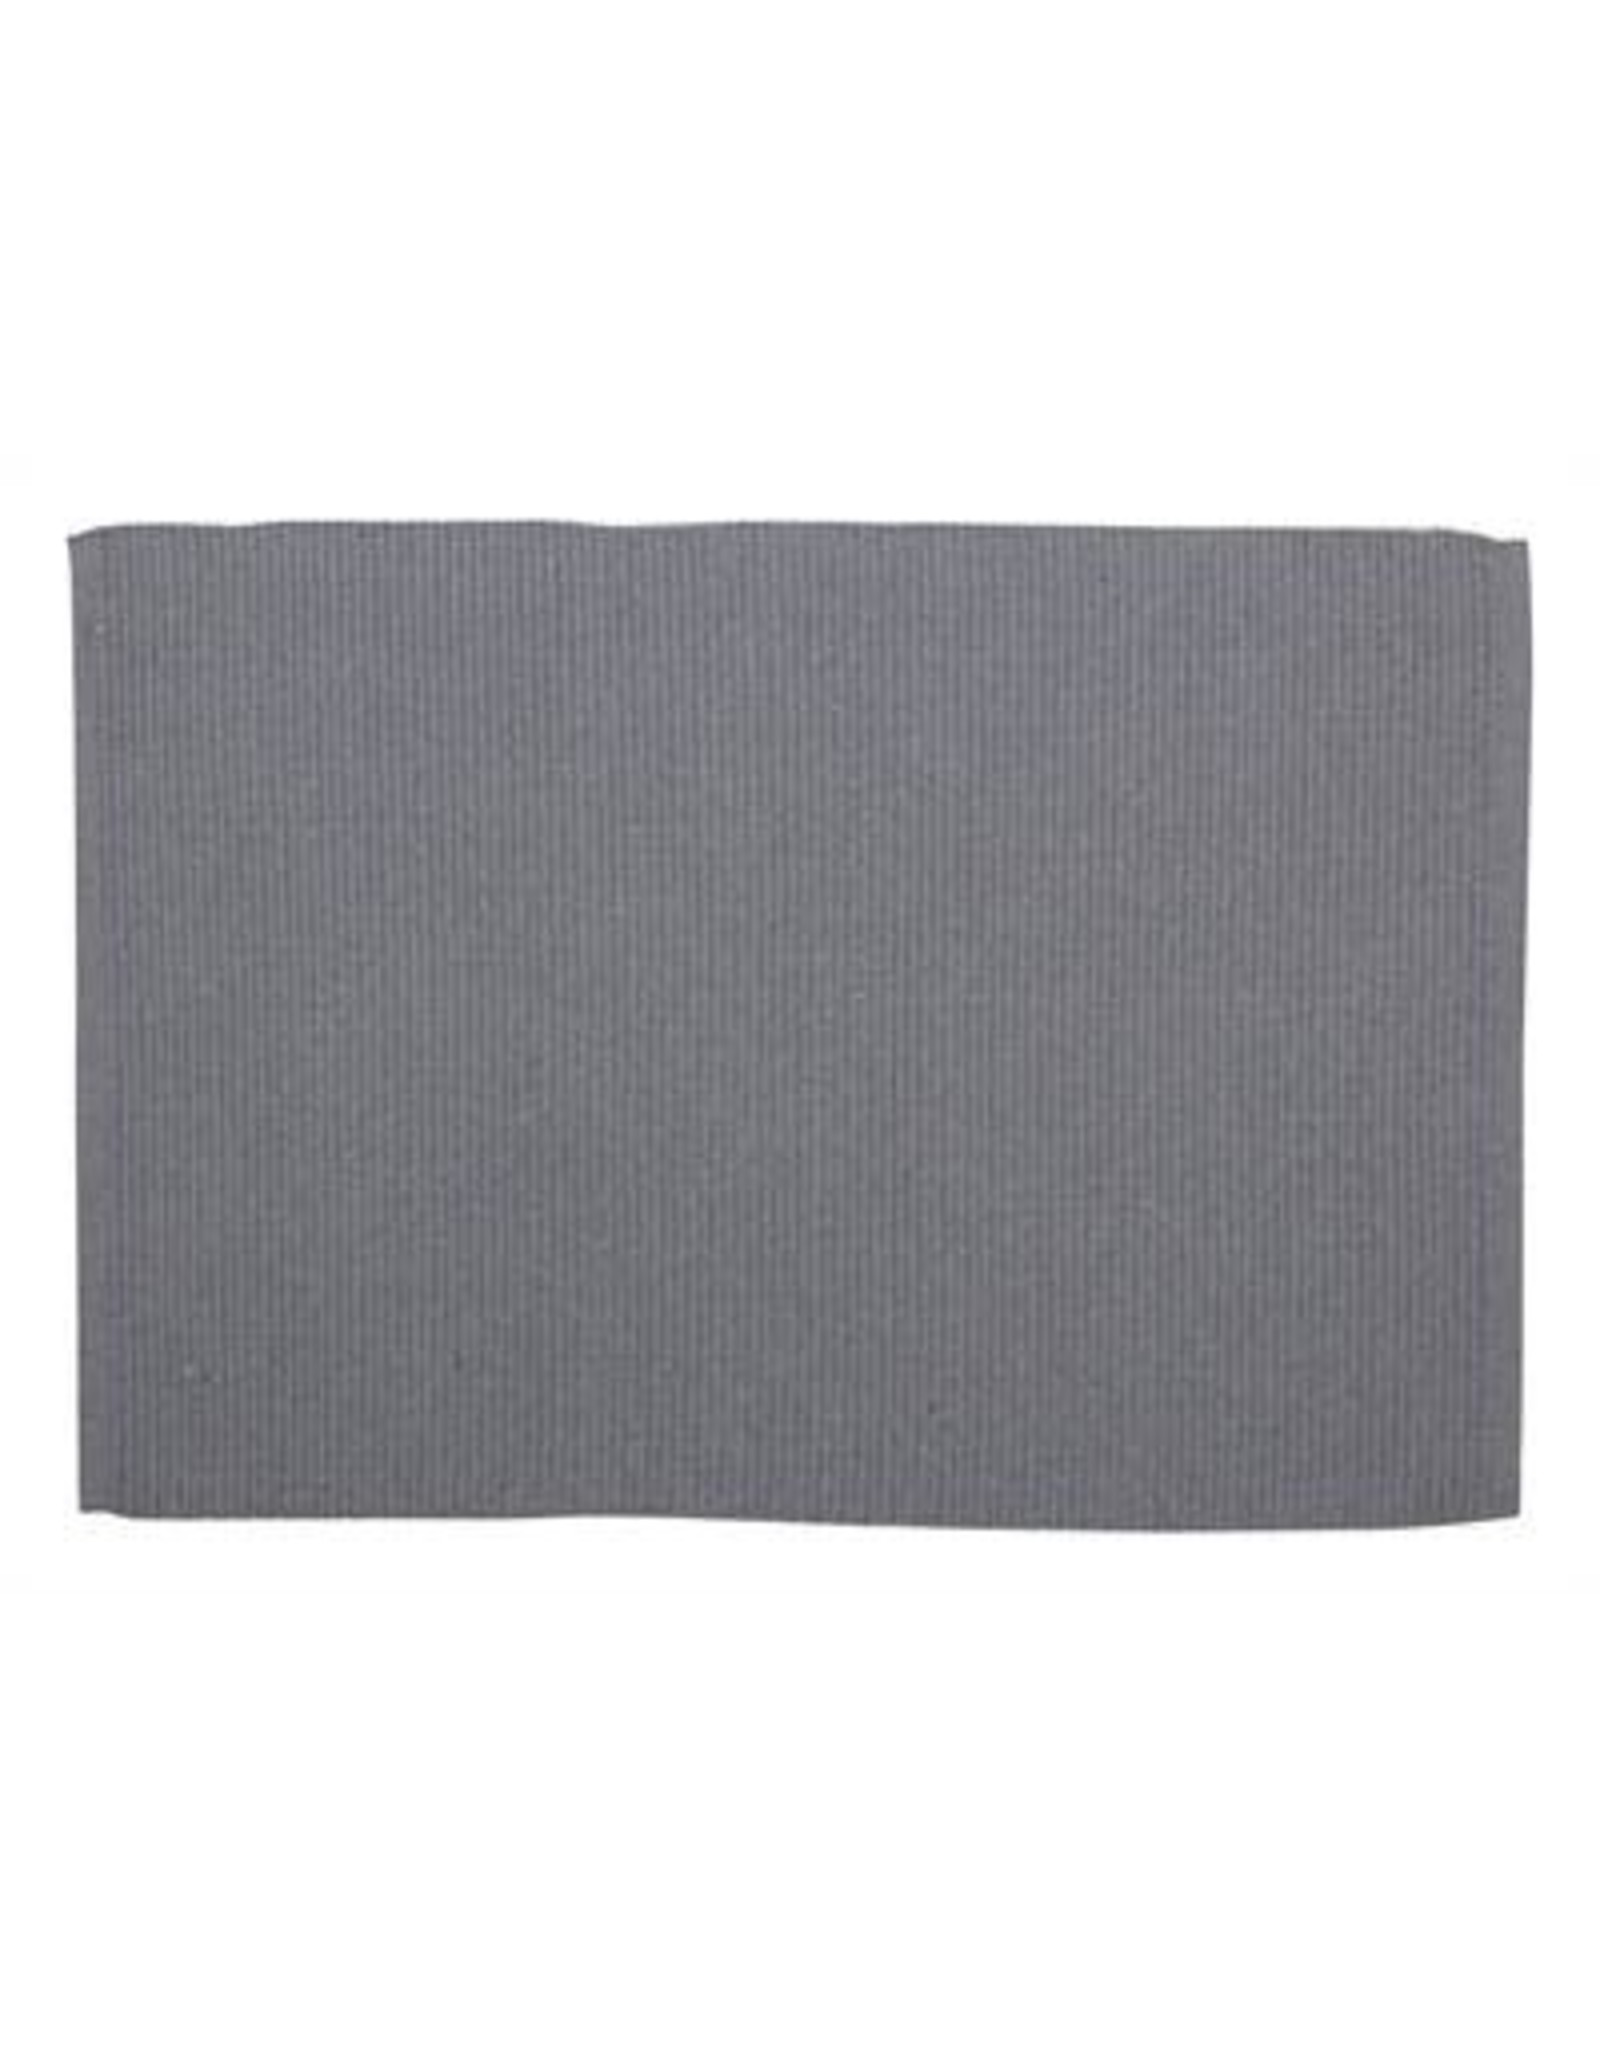 Texstyles Deco Napperon gris